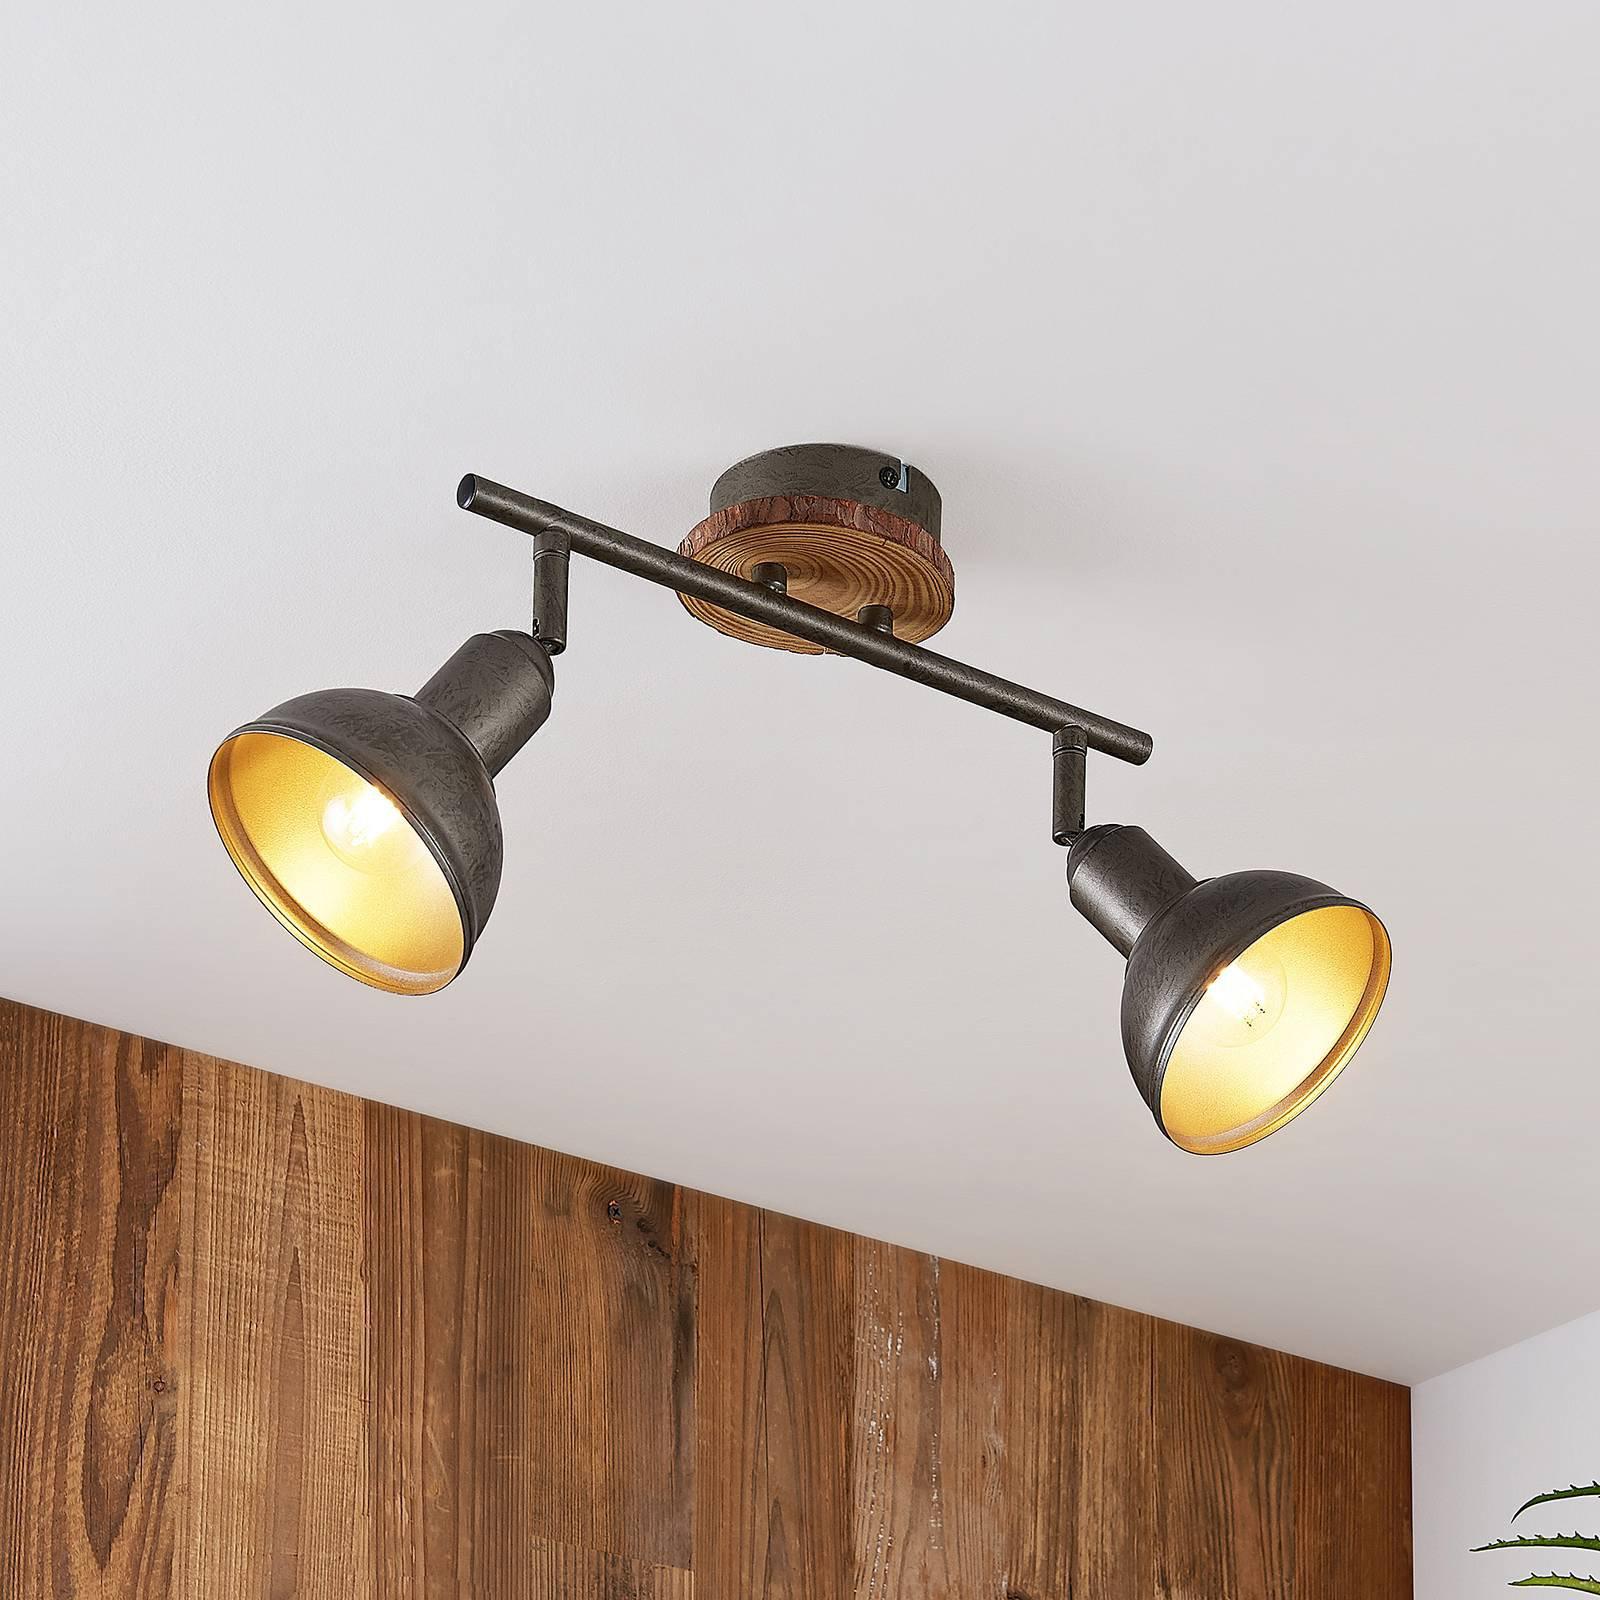 Lindby Nesrin taklampe med treskive, 2 lyskilder